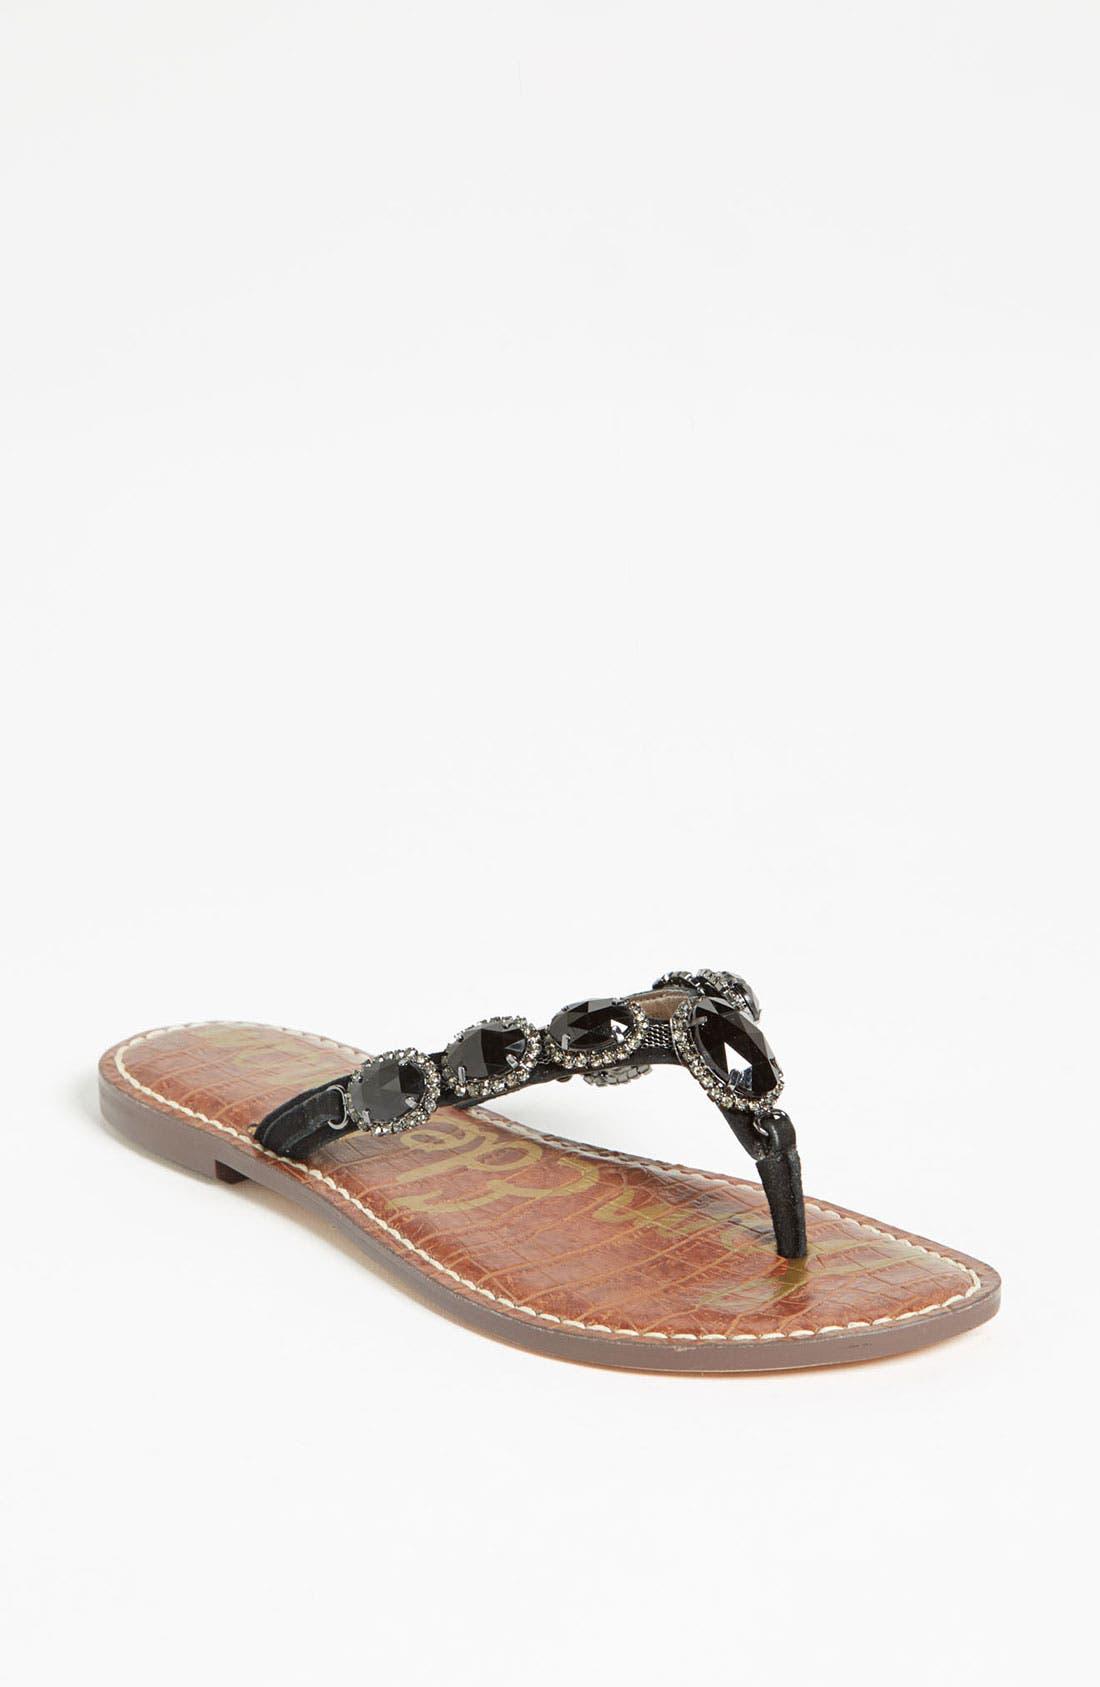 Main Image - Sam Edelman 'Gracelyn' Sandal